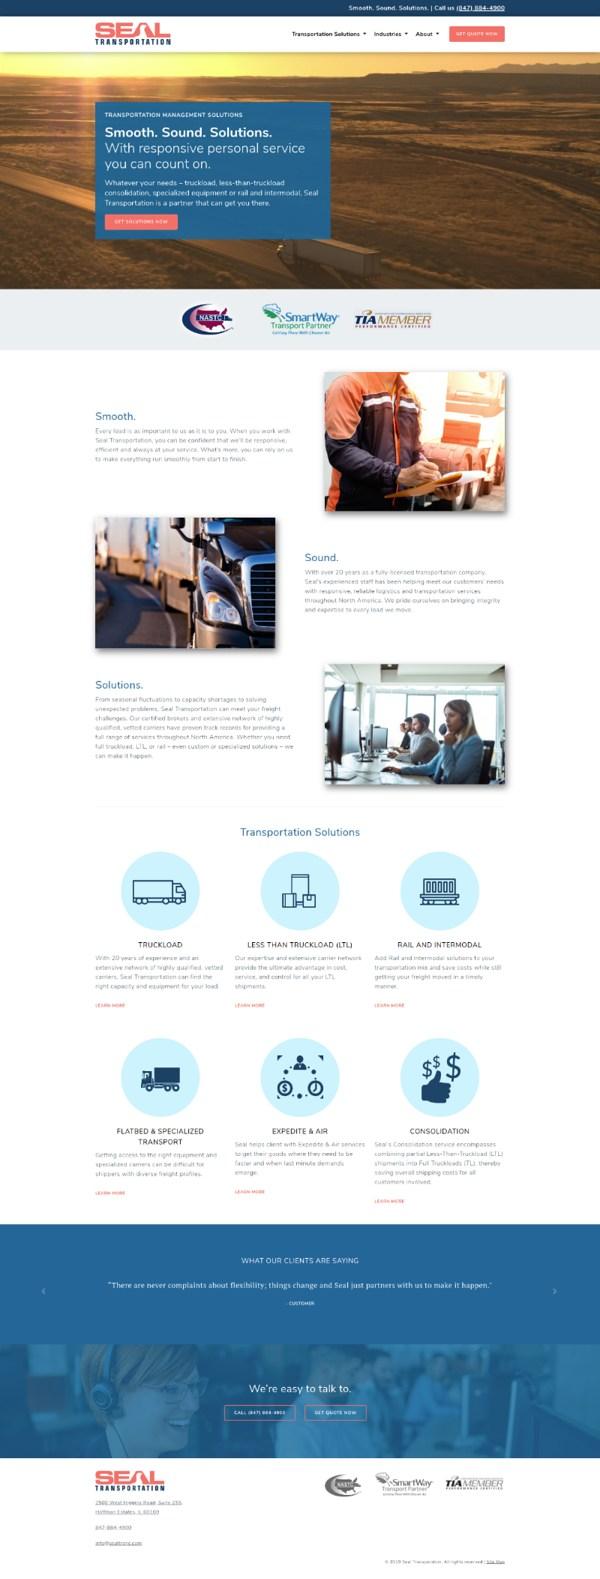 seal trans responsive wwebsite design.jpg